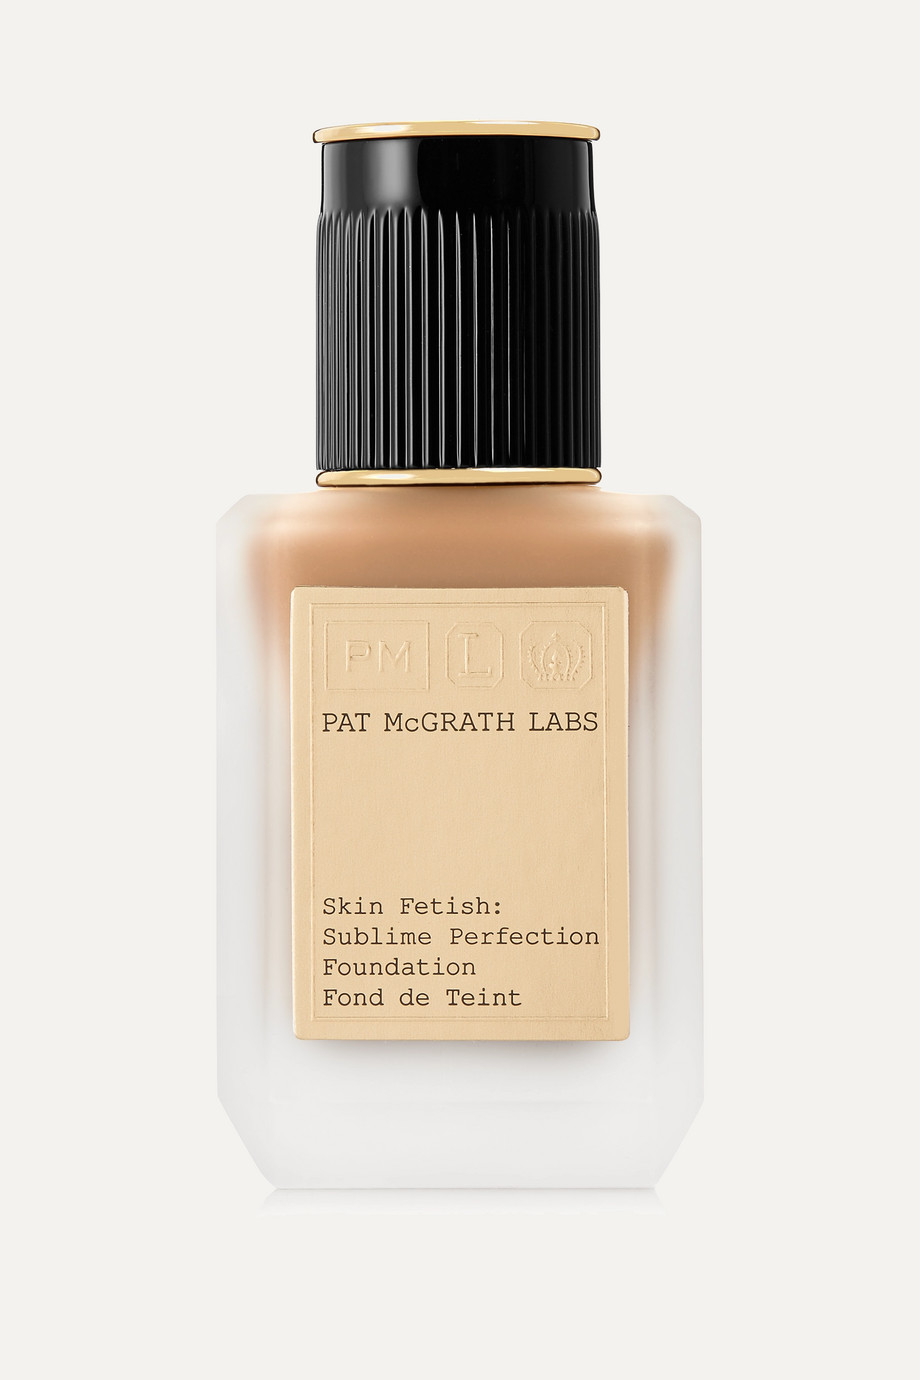 Pat McGrath Labs Skin Fetish: Sublime Perfection Foundation – Medium 18, 35 ml – Foundation